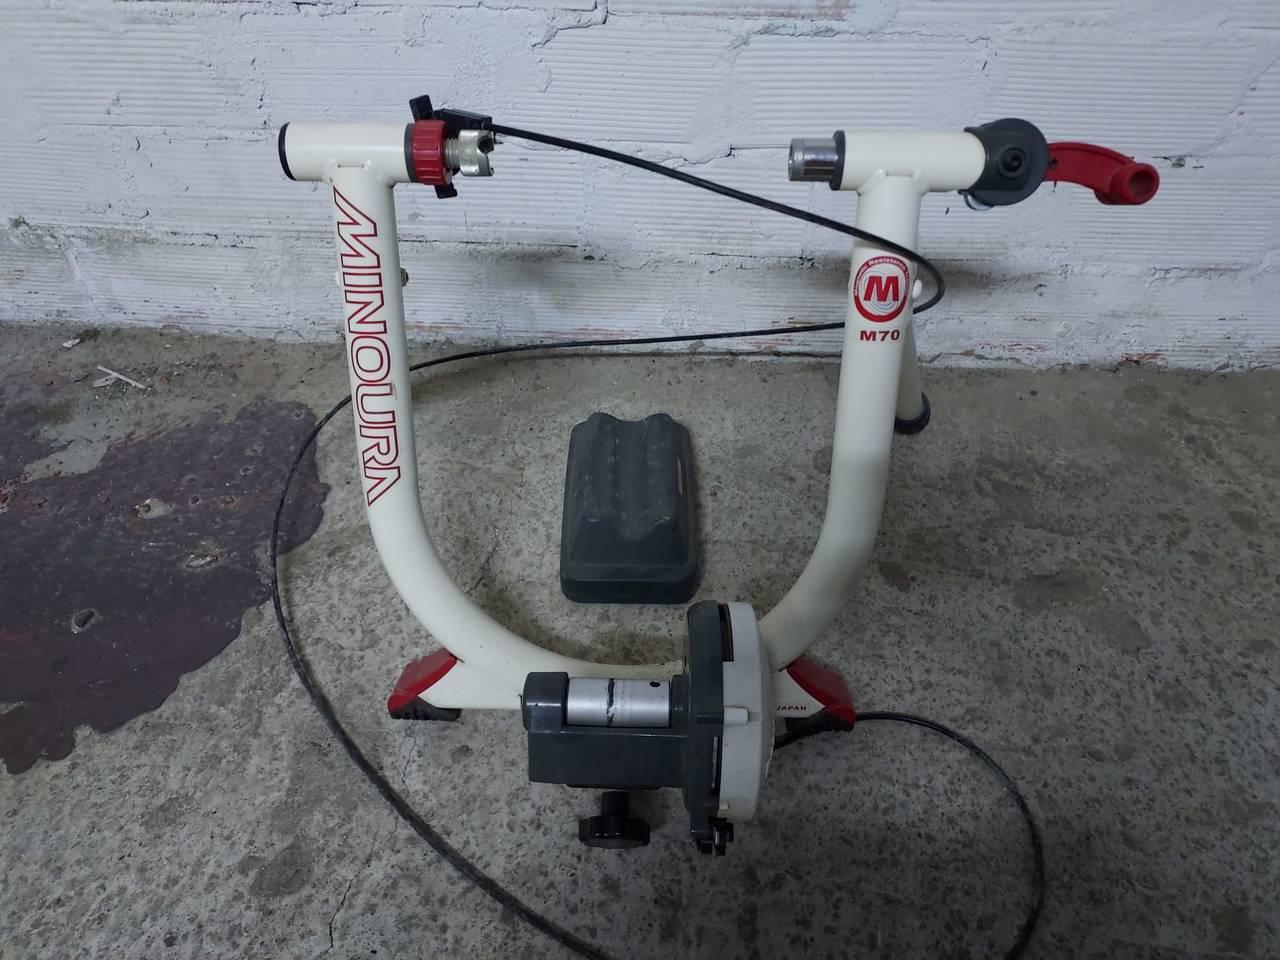 Rodillo de entrenamiento bicicleta.  - Foto 1